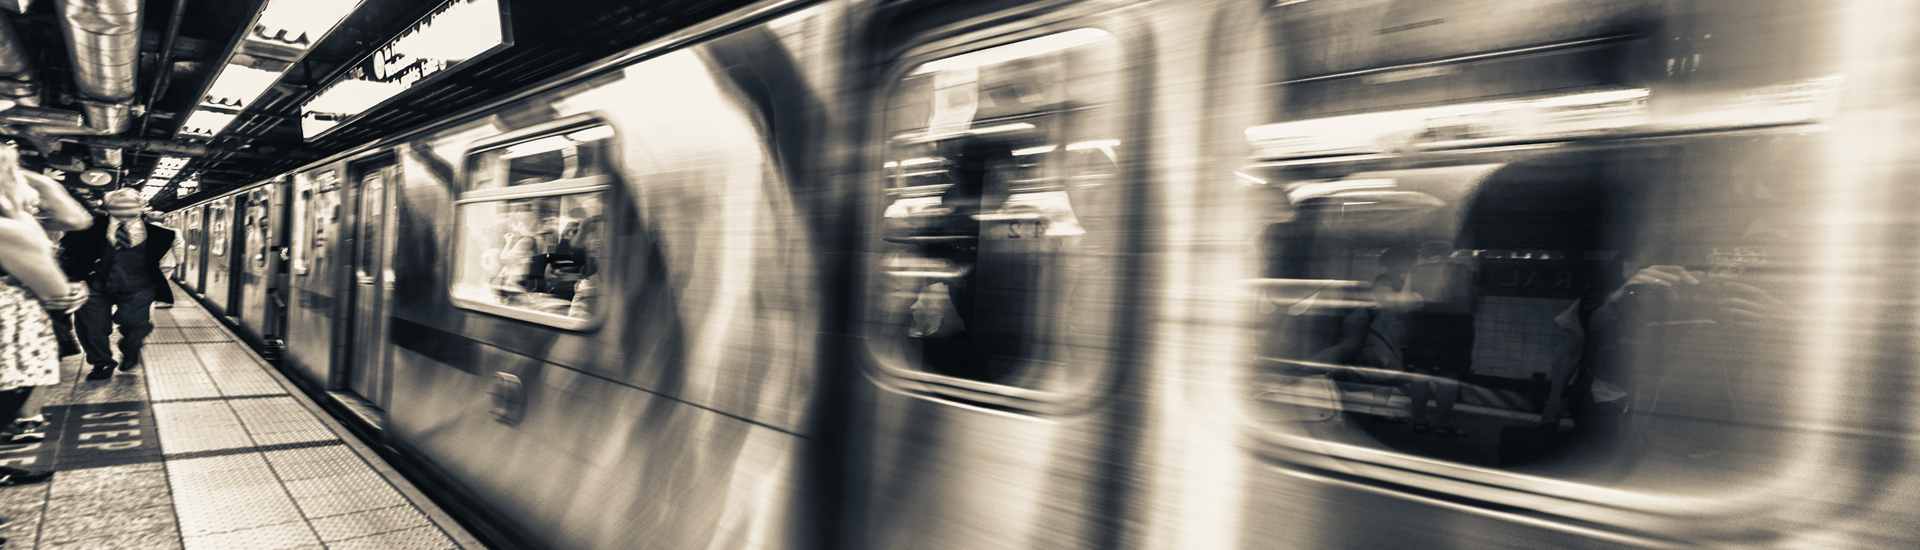 10 amazing secrets of the New York subway